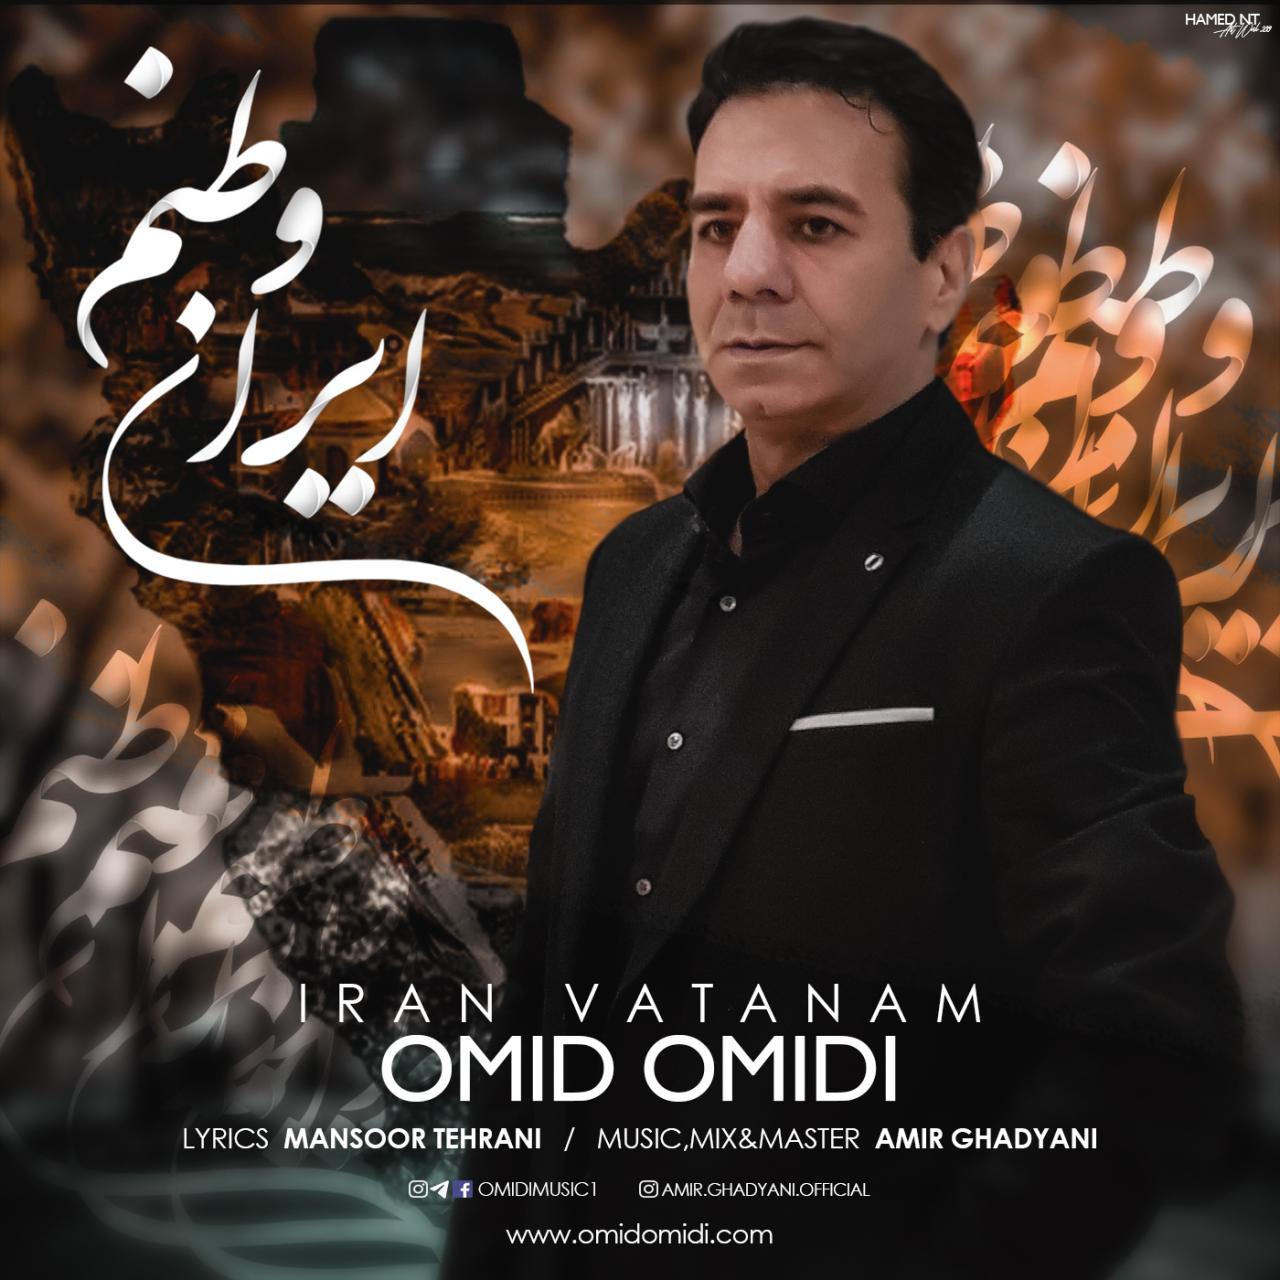 Omid Omidi – Iran Vatanam